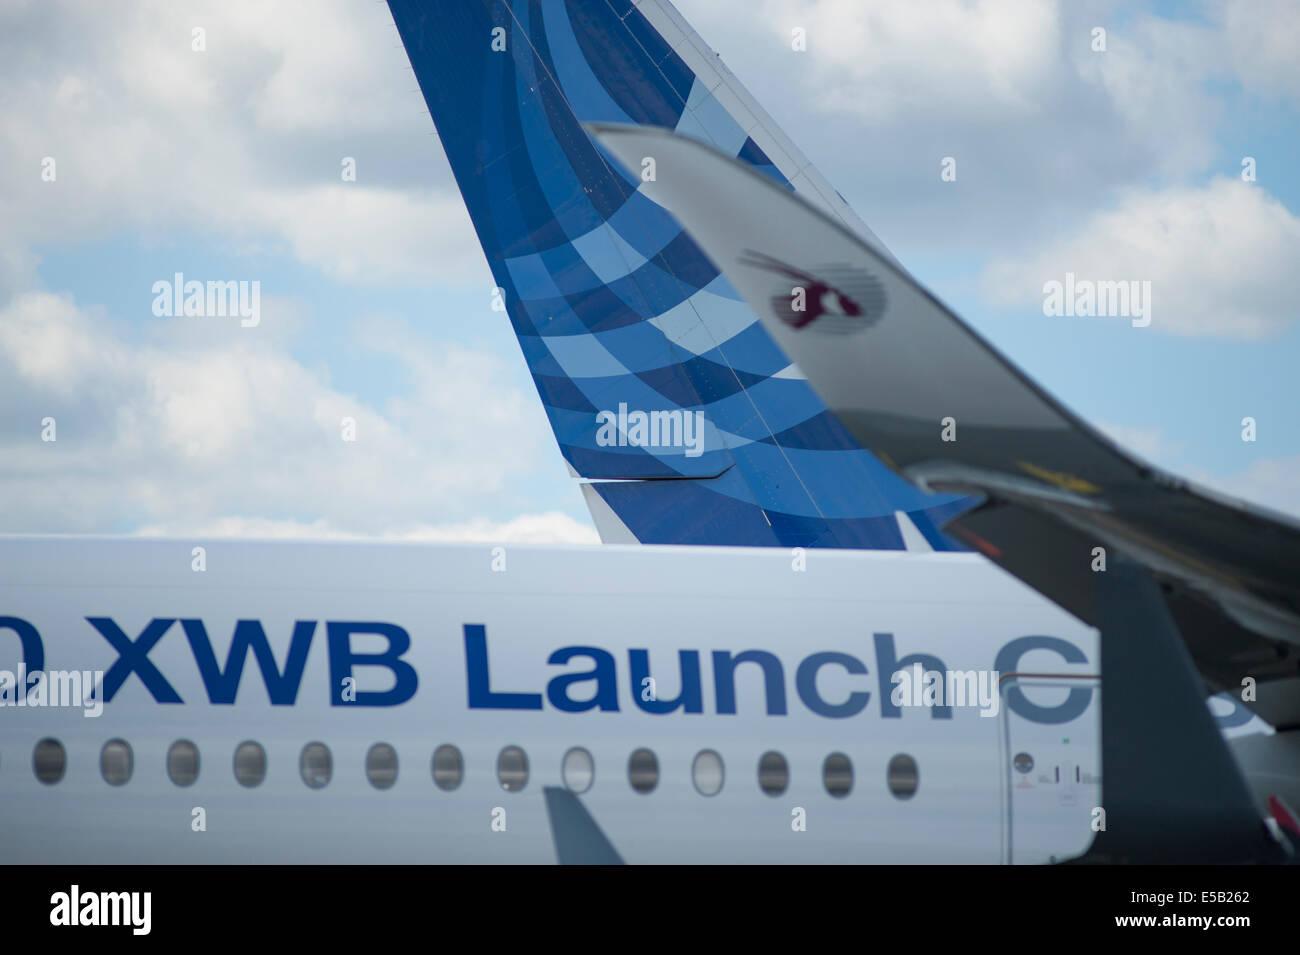 Airbus A350 XWB at the Farnborough International Airshow 2014 - Stock Image